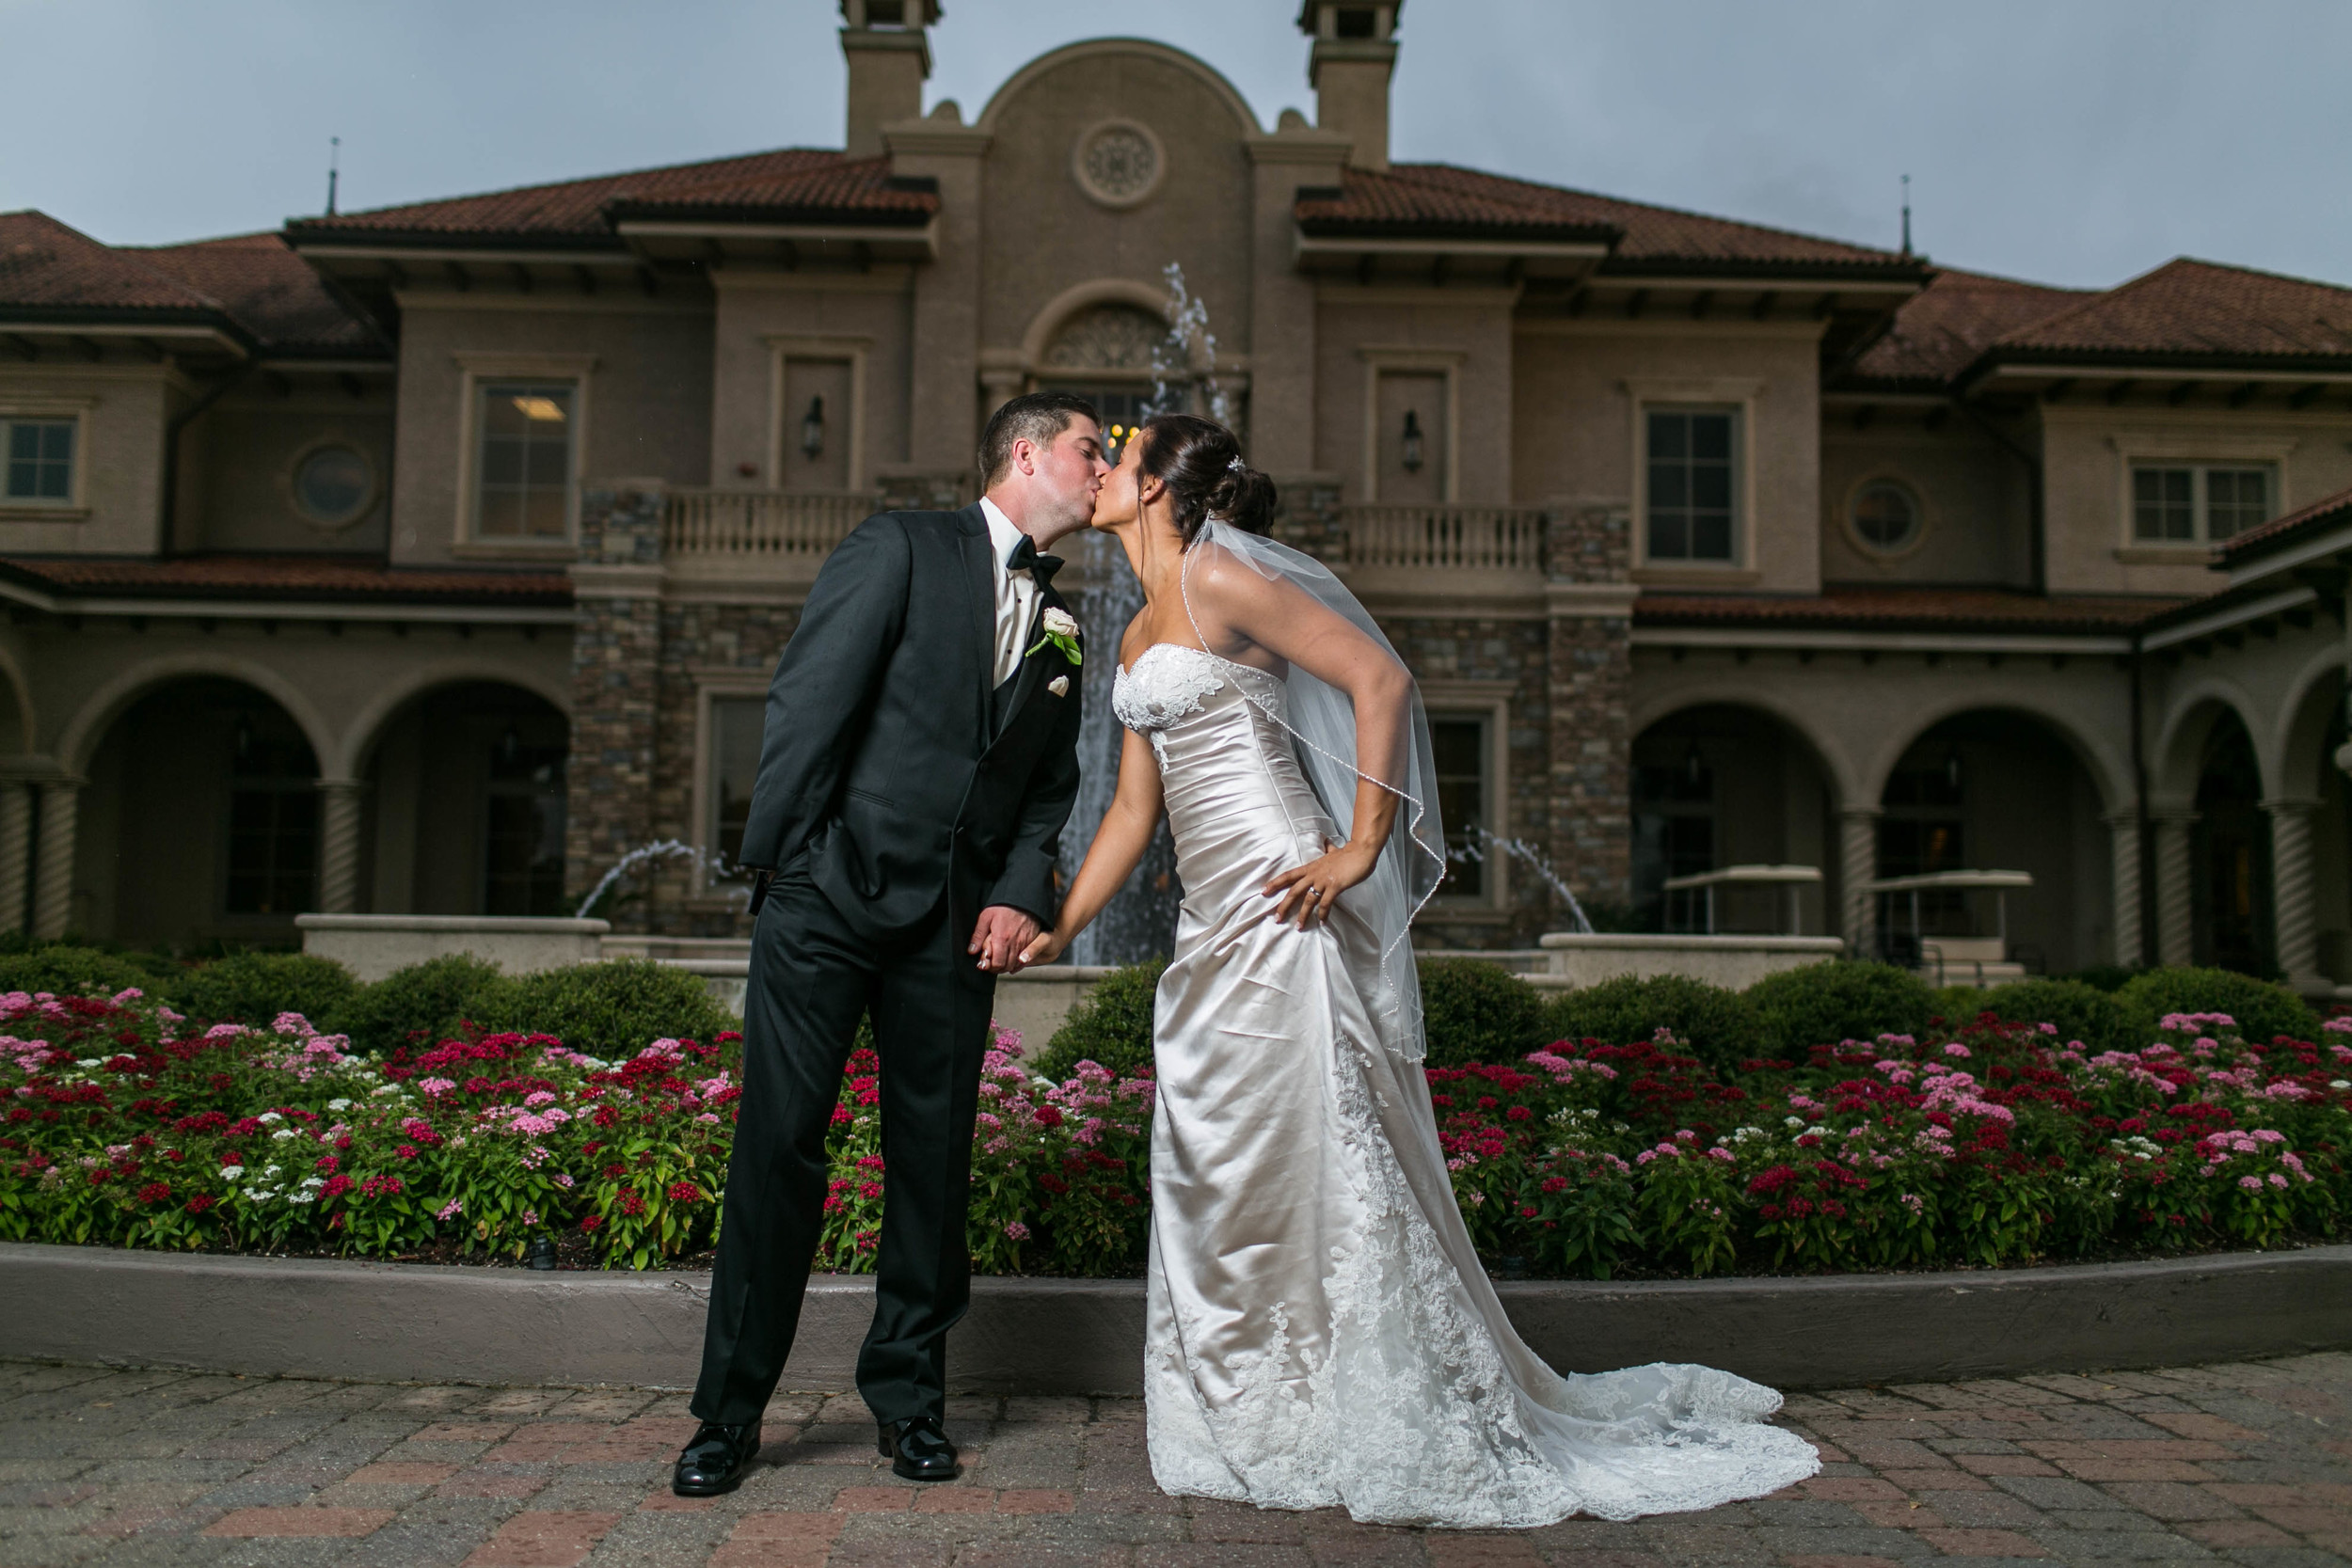 adam-szarmack-ponte-vedra-wedding-photographer-bridal-b.jpg